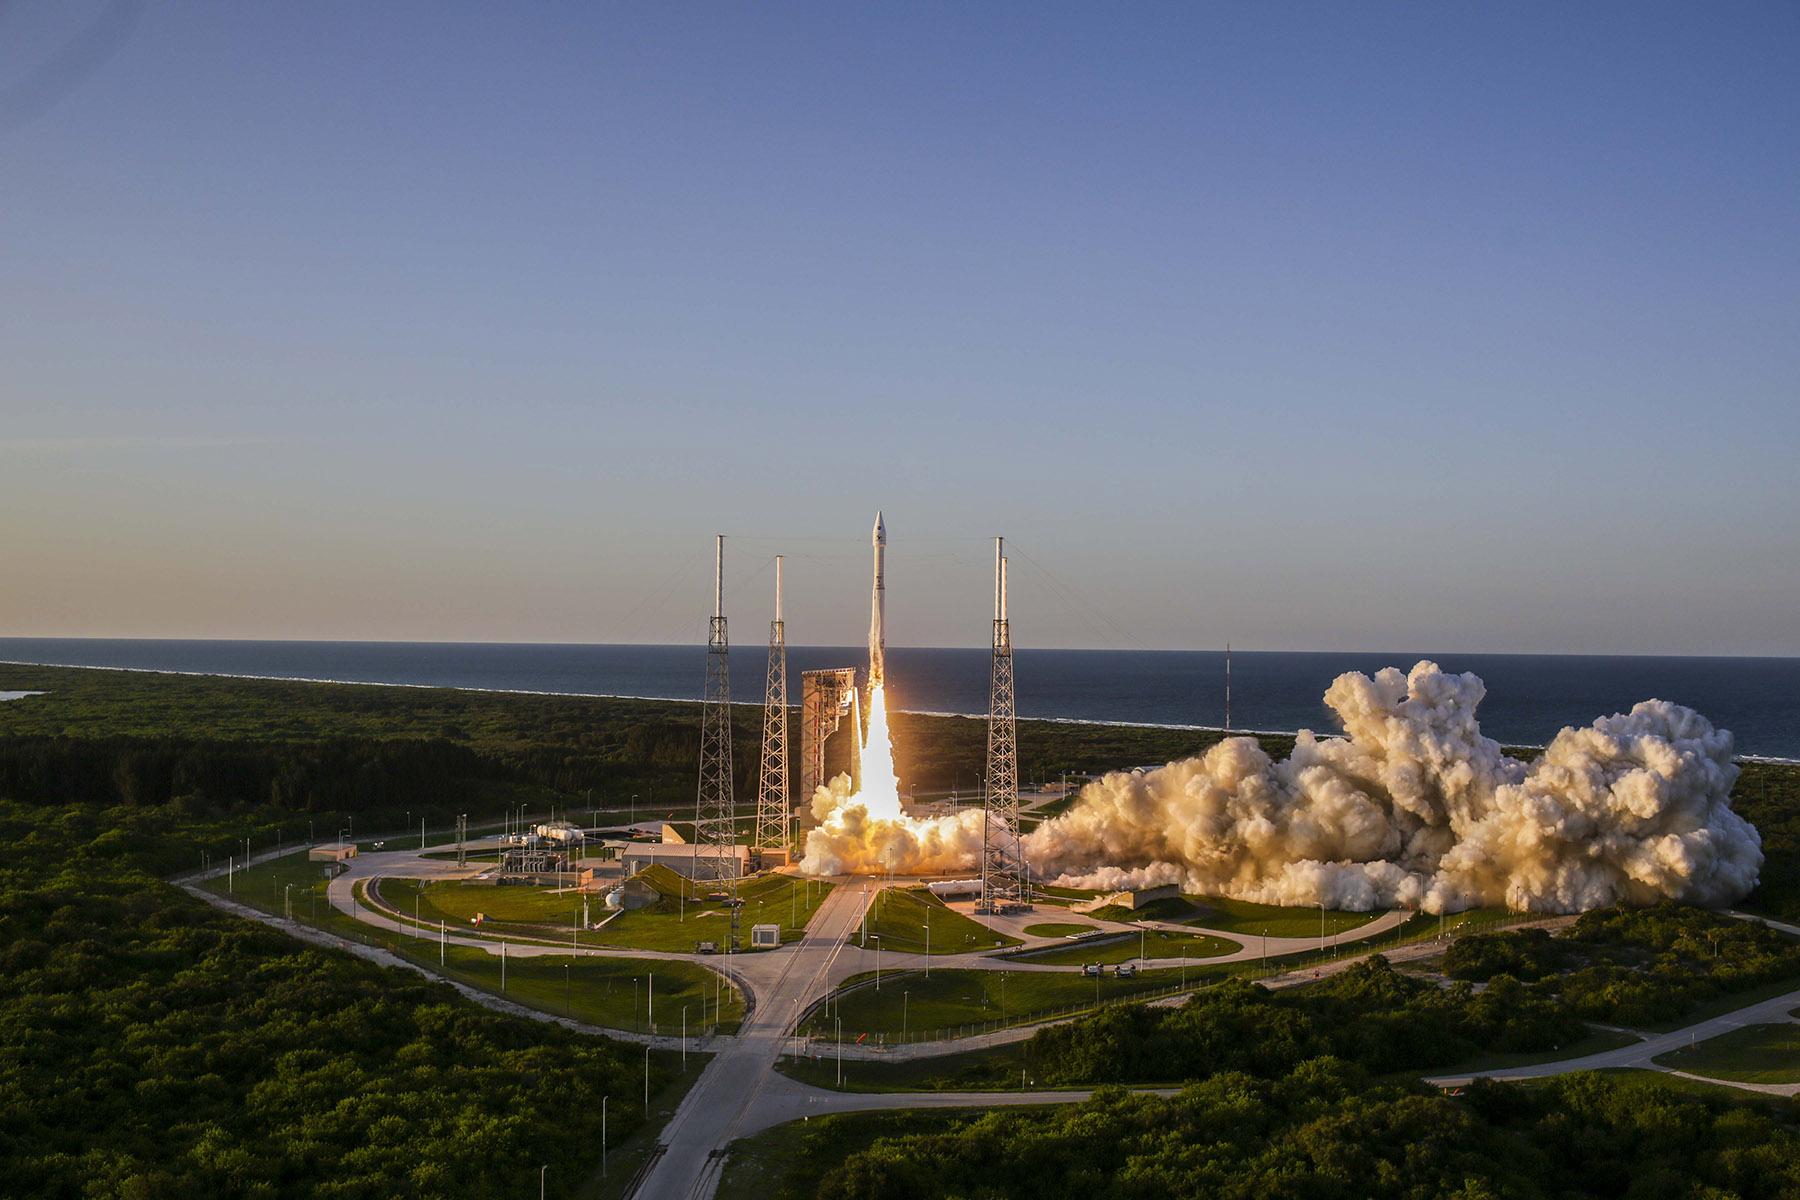 Launch Photos: NASA's OSIRIS-REx Asteroid Mission Blasts Off